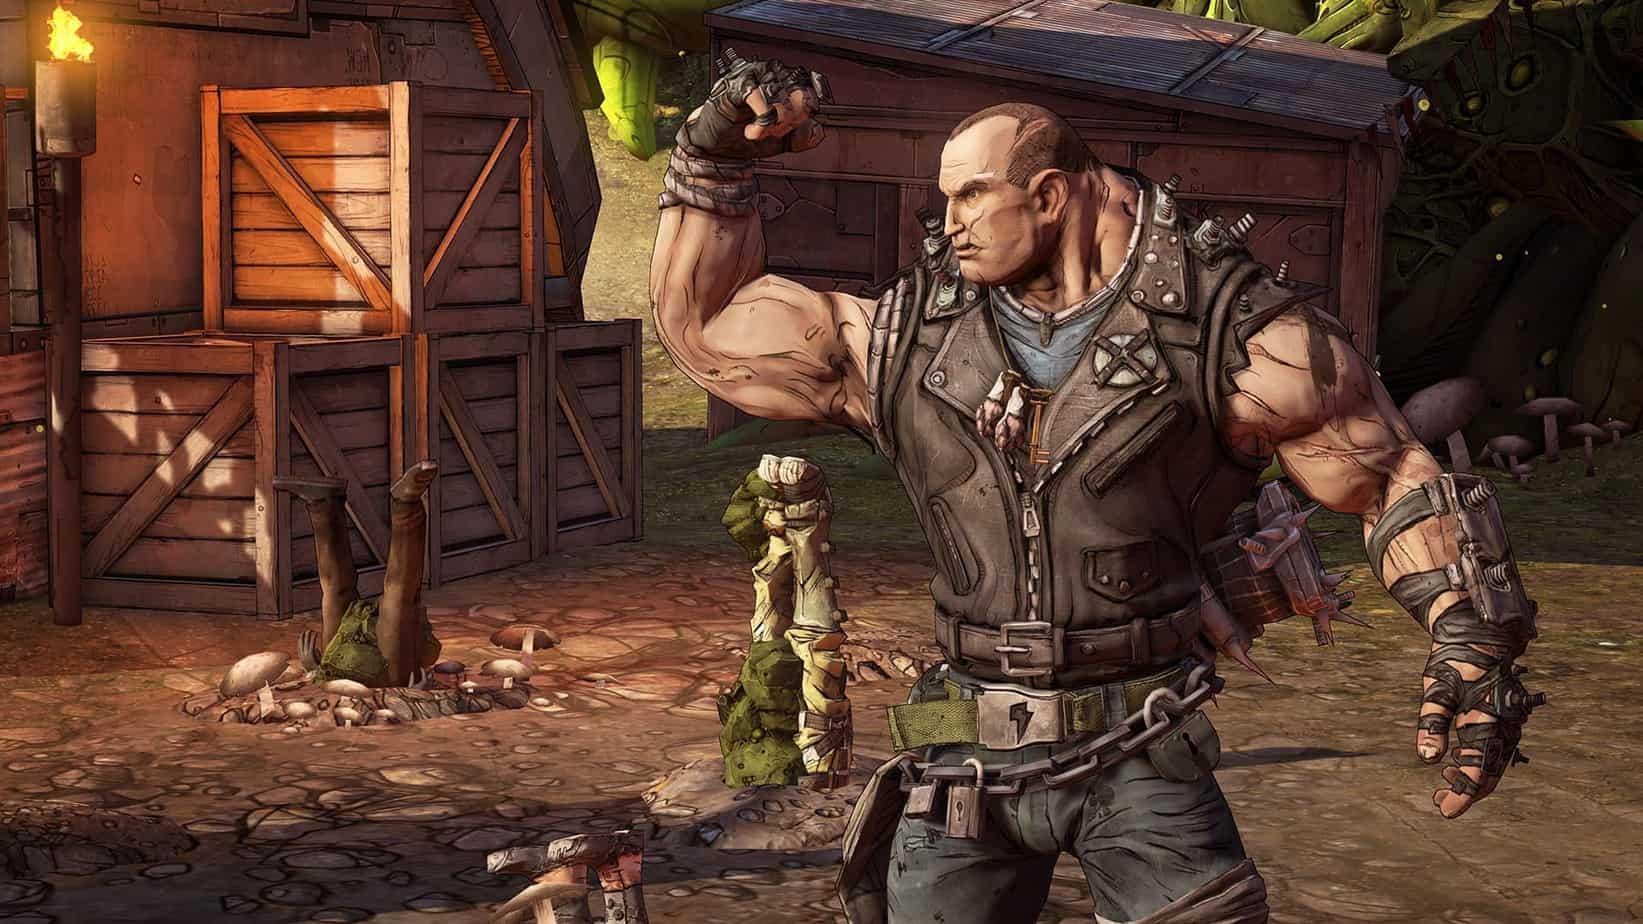 Borderlands 2 Commander Lilith & The Fight For Sanctuary графика игры